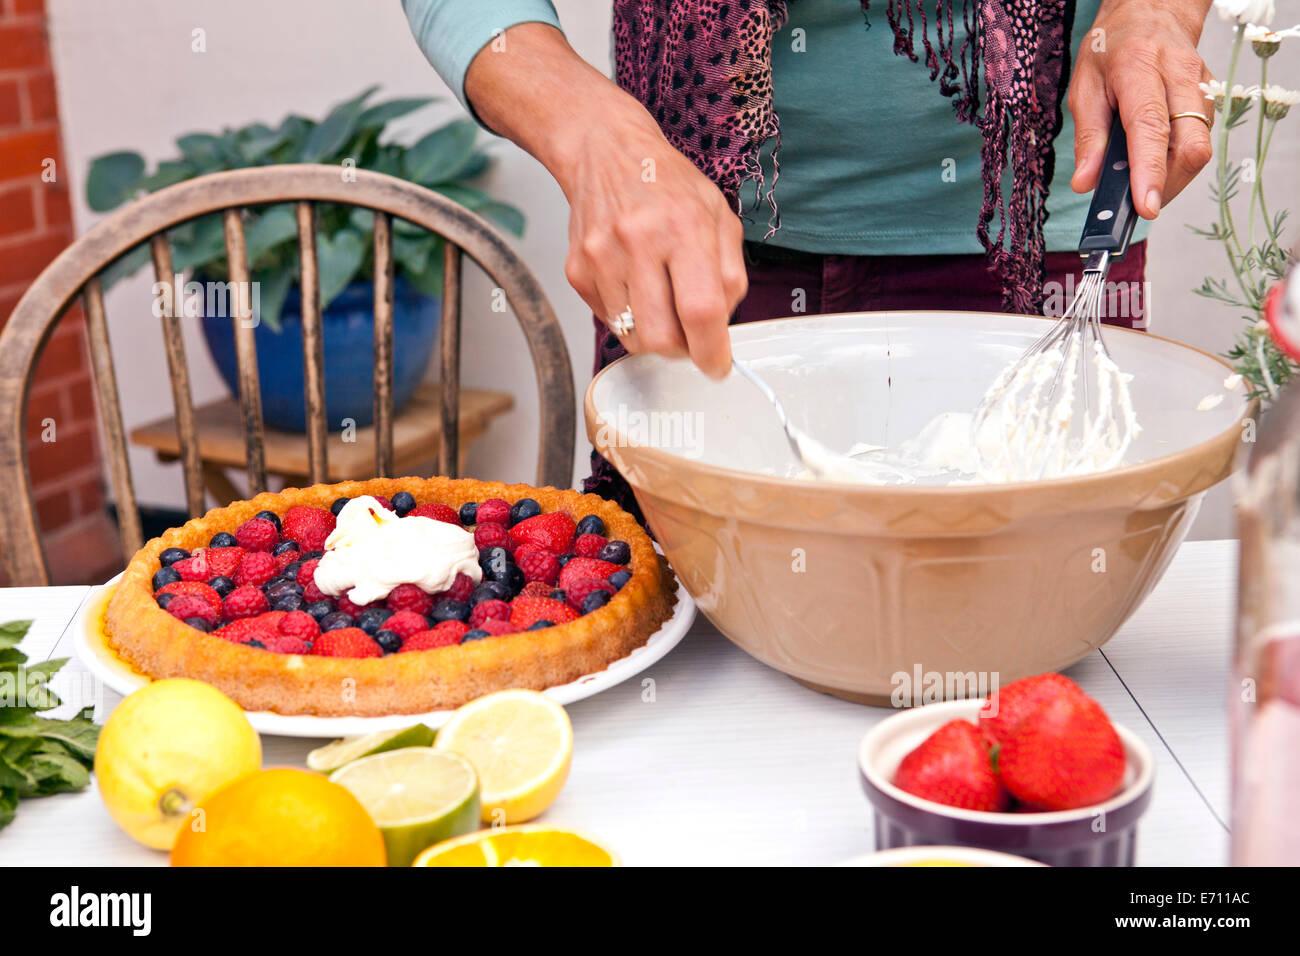 Cropped shot of mature woman preparing fruit flan at garden party - Stock Image